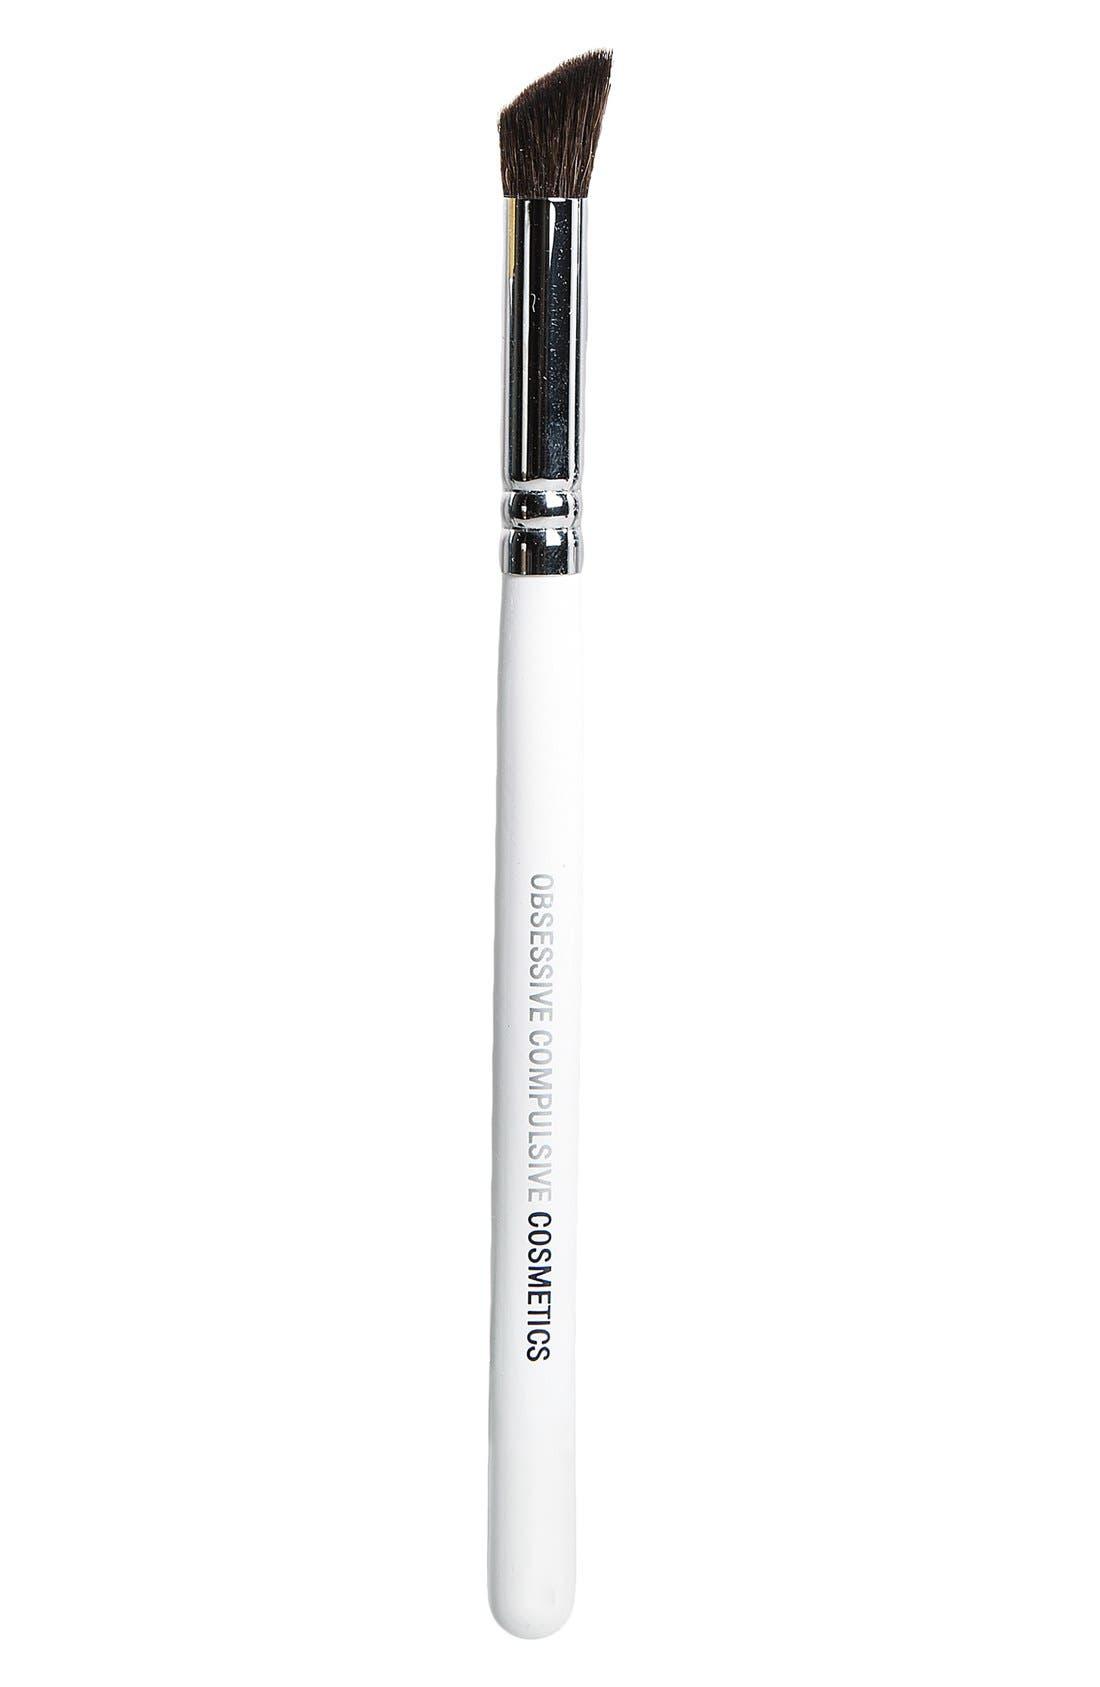 Obsessive Compulsive Cosmetics Angled Blending Brush